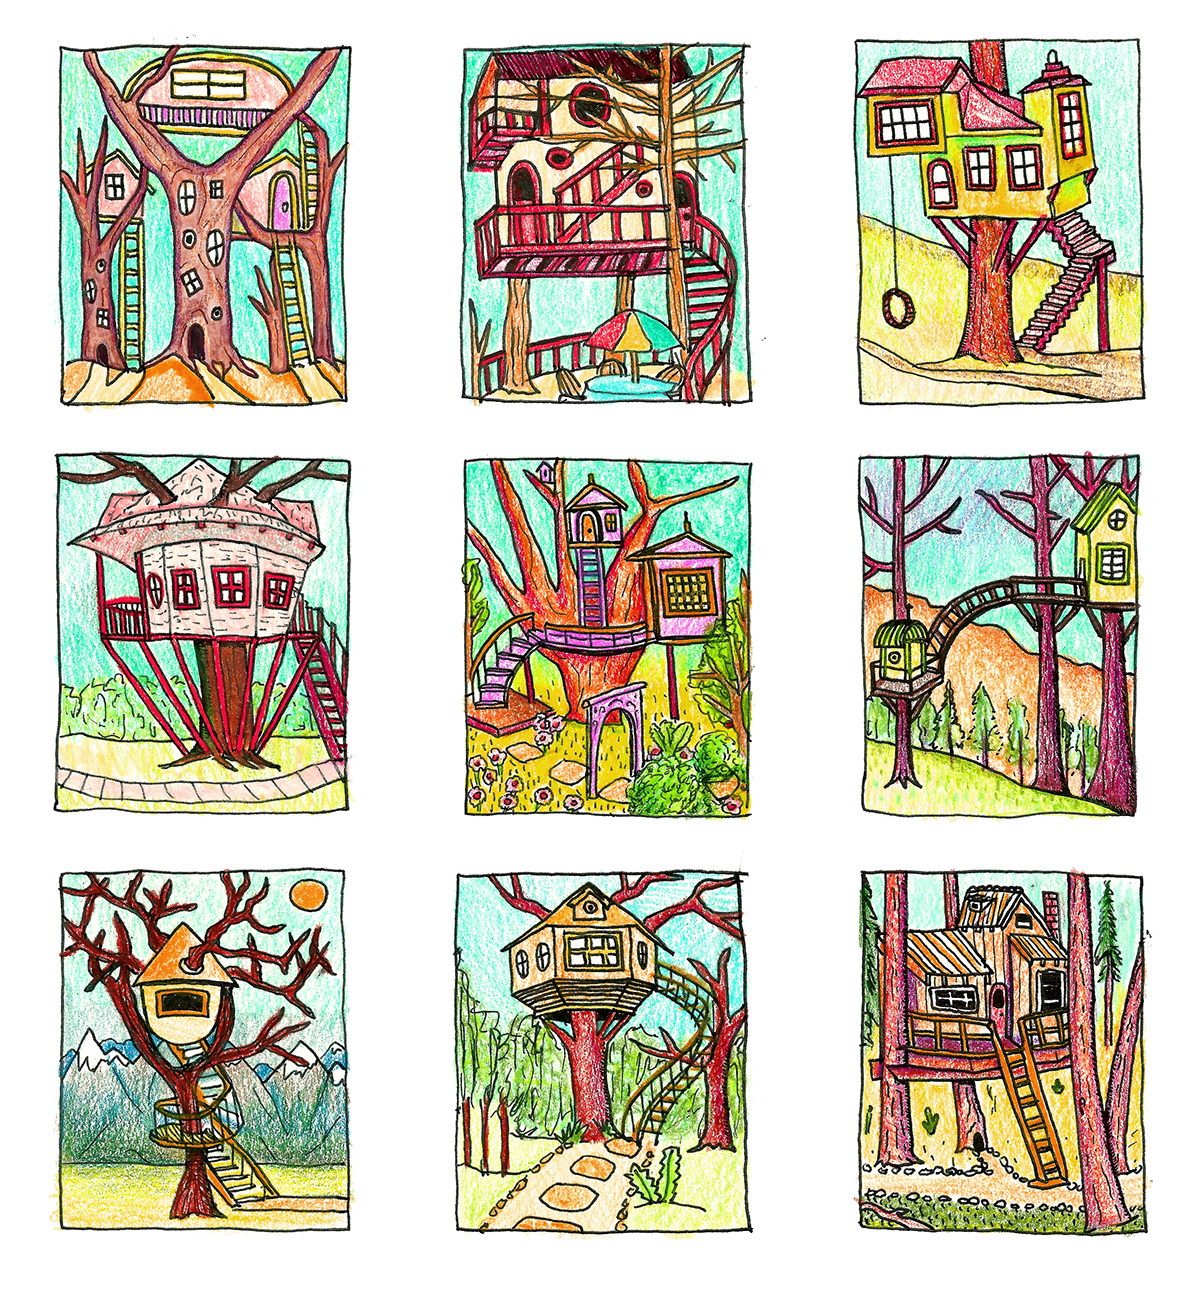 Tree  house sketch prismacolor pen